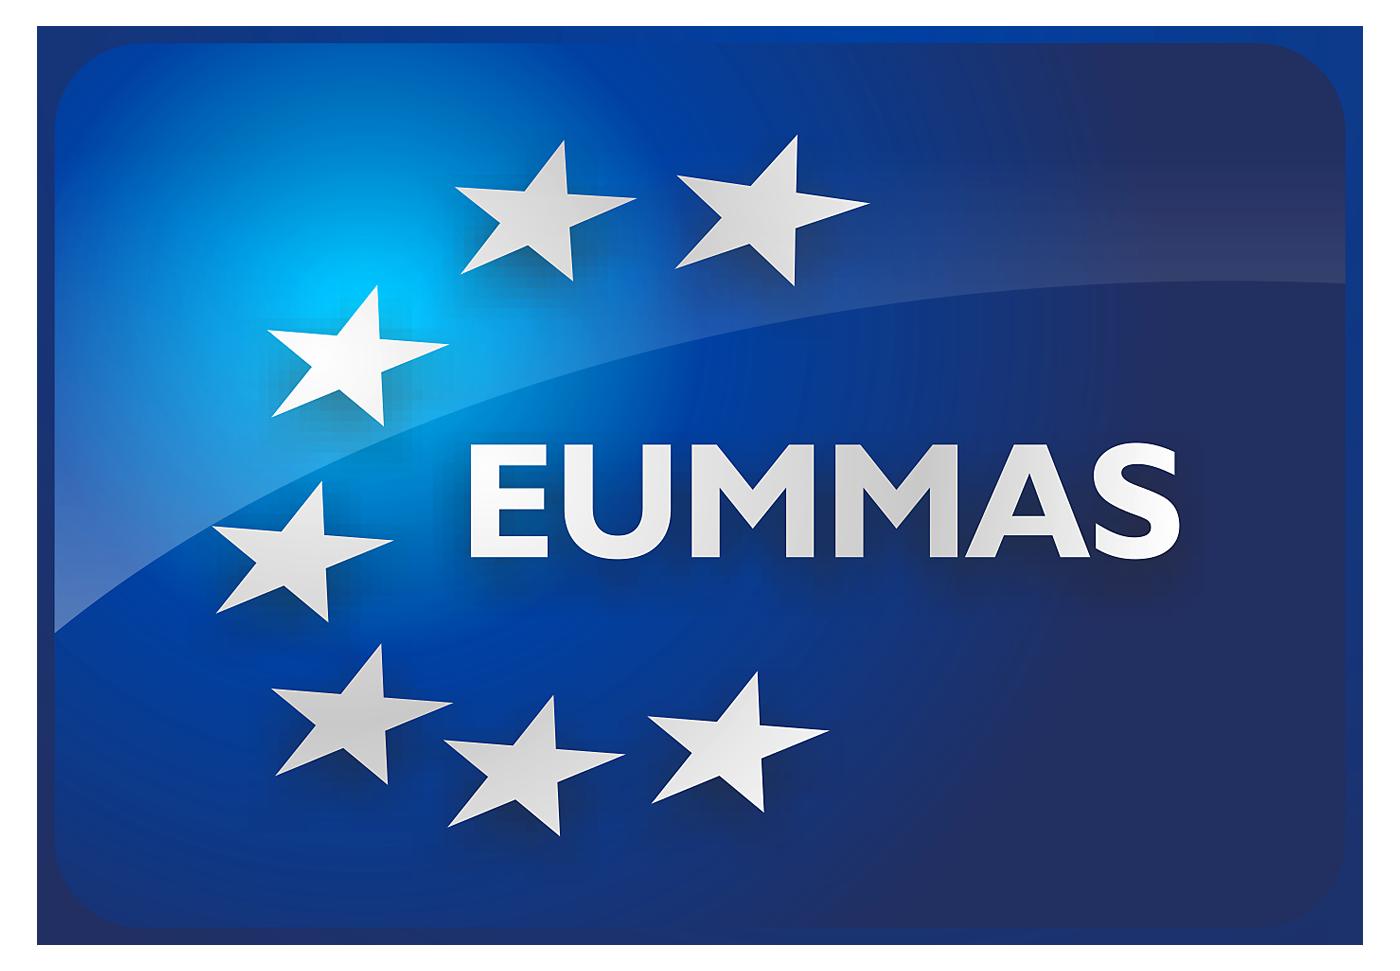 EUMMAS CONFERENCE